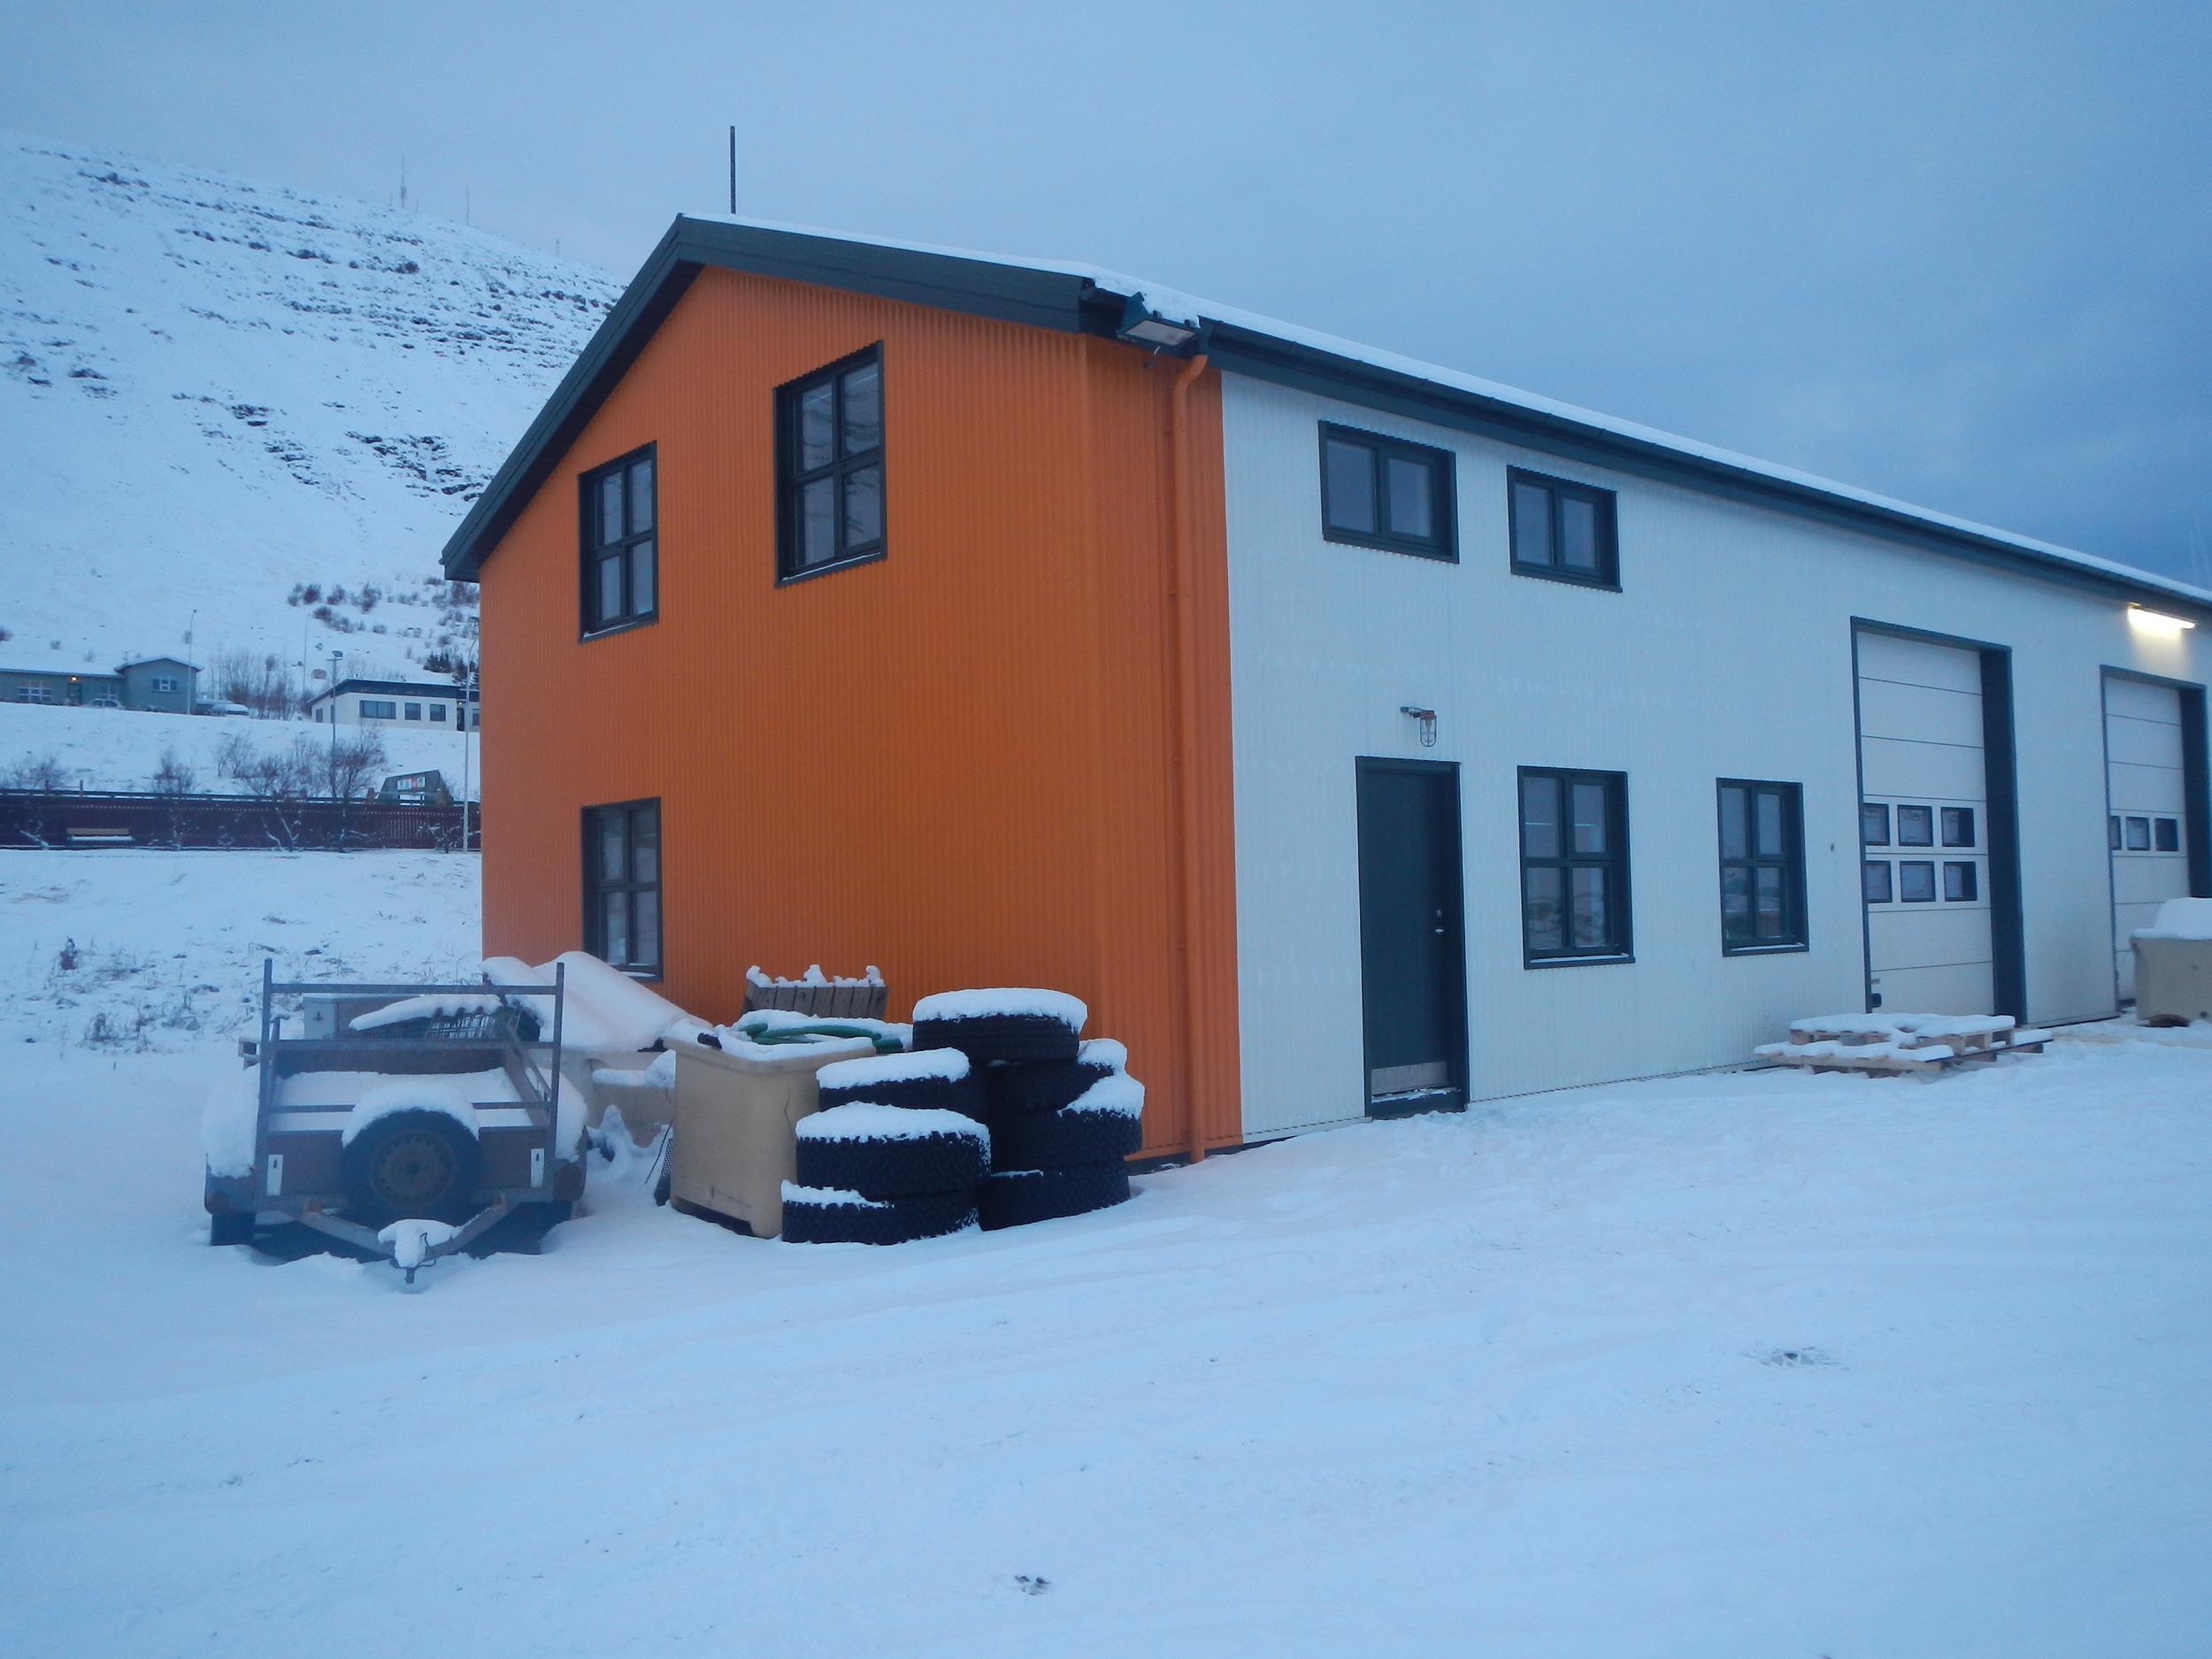 Harbor House exterior